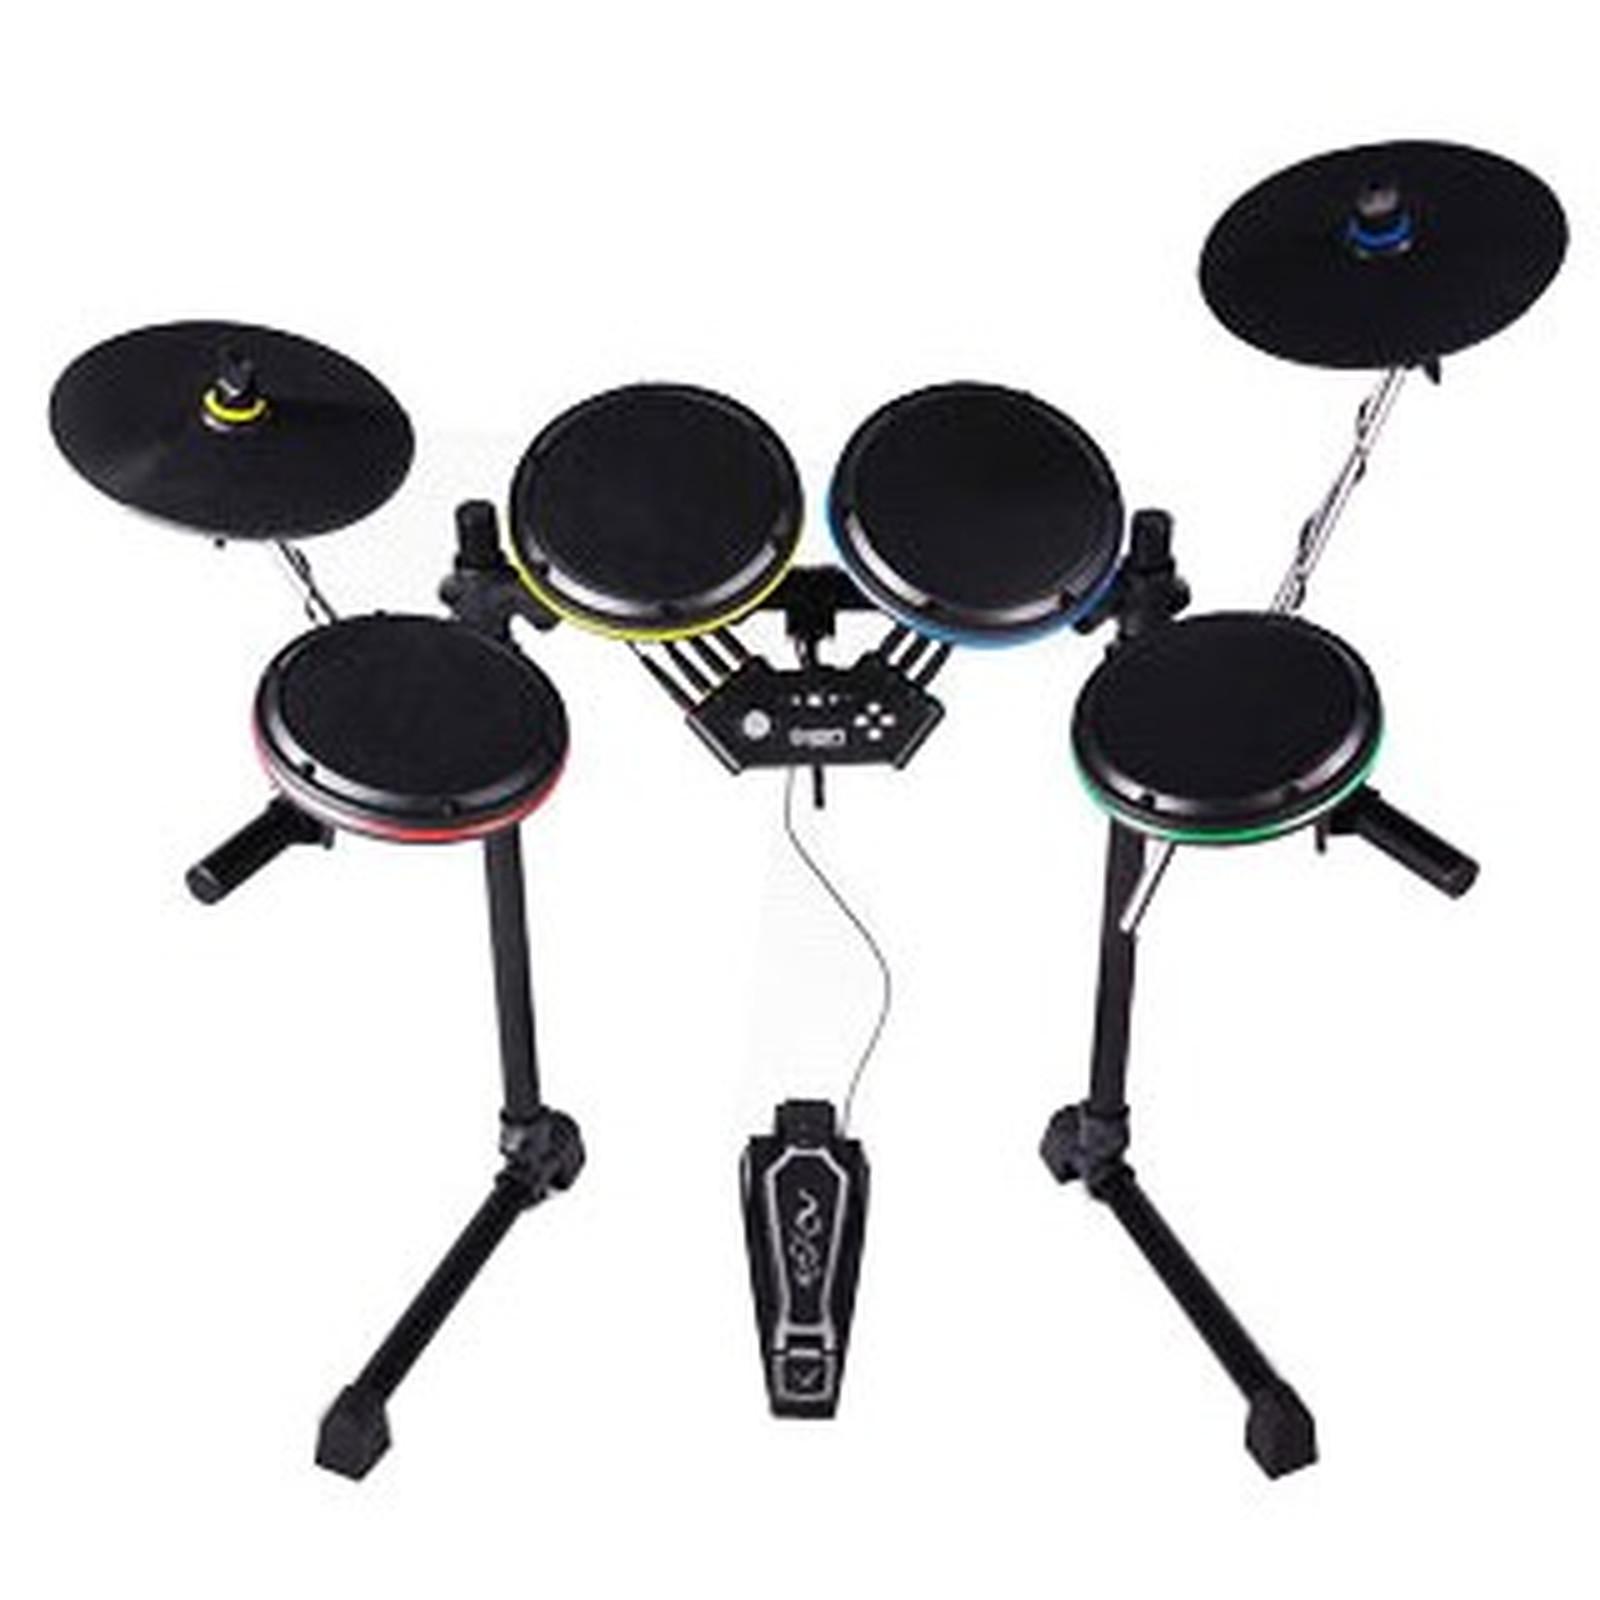 Ion Drum Rocker Xbox 360